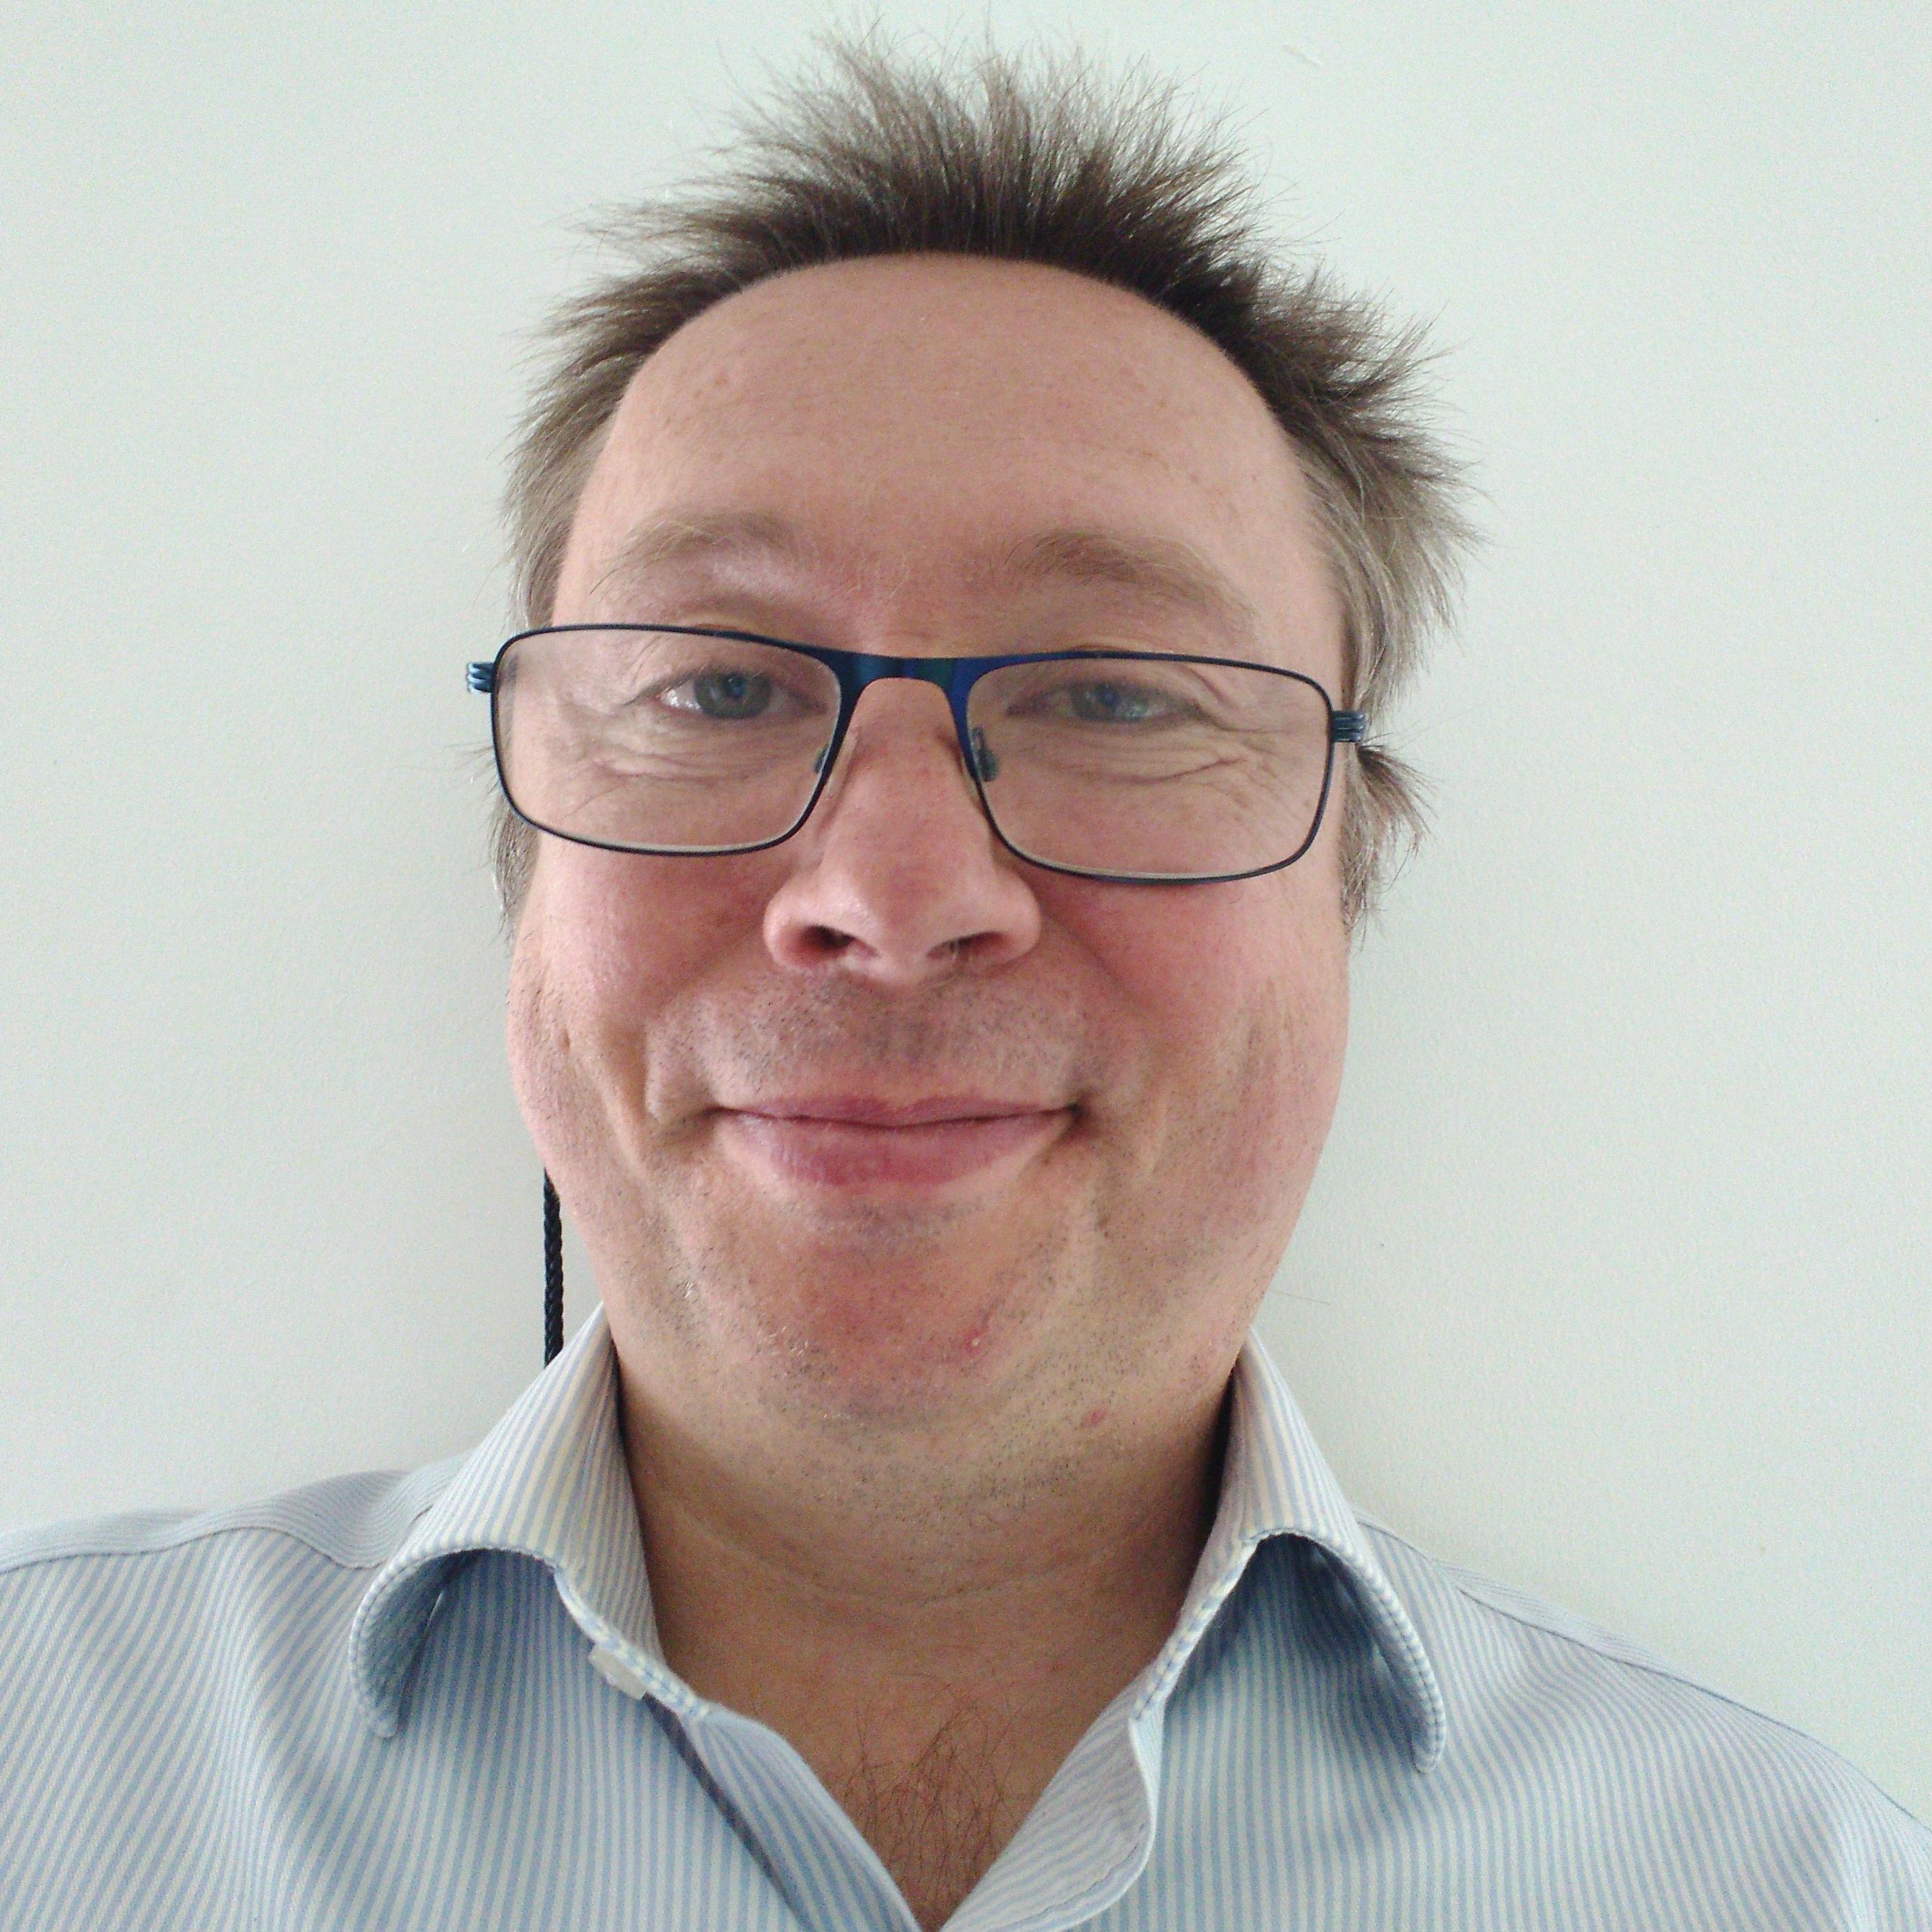 Moray Jones, Developer at mySociety